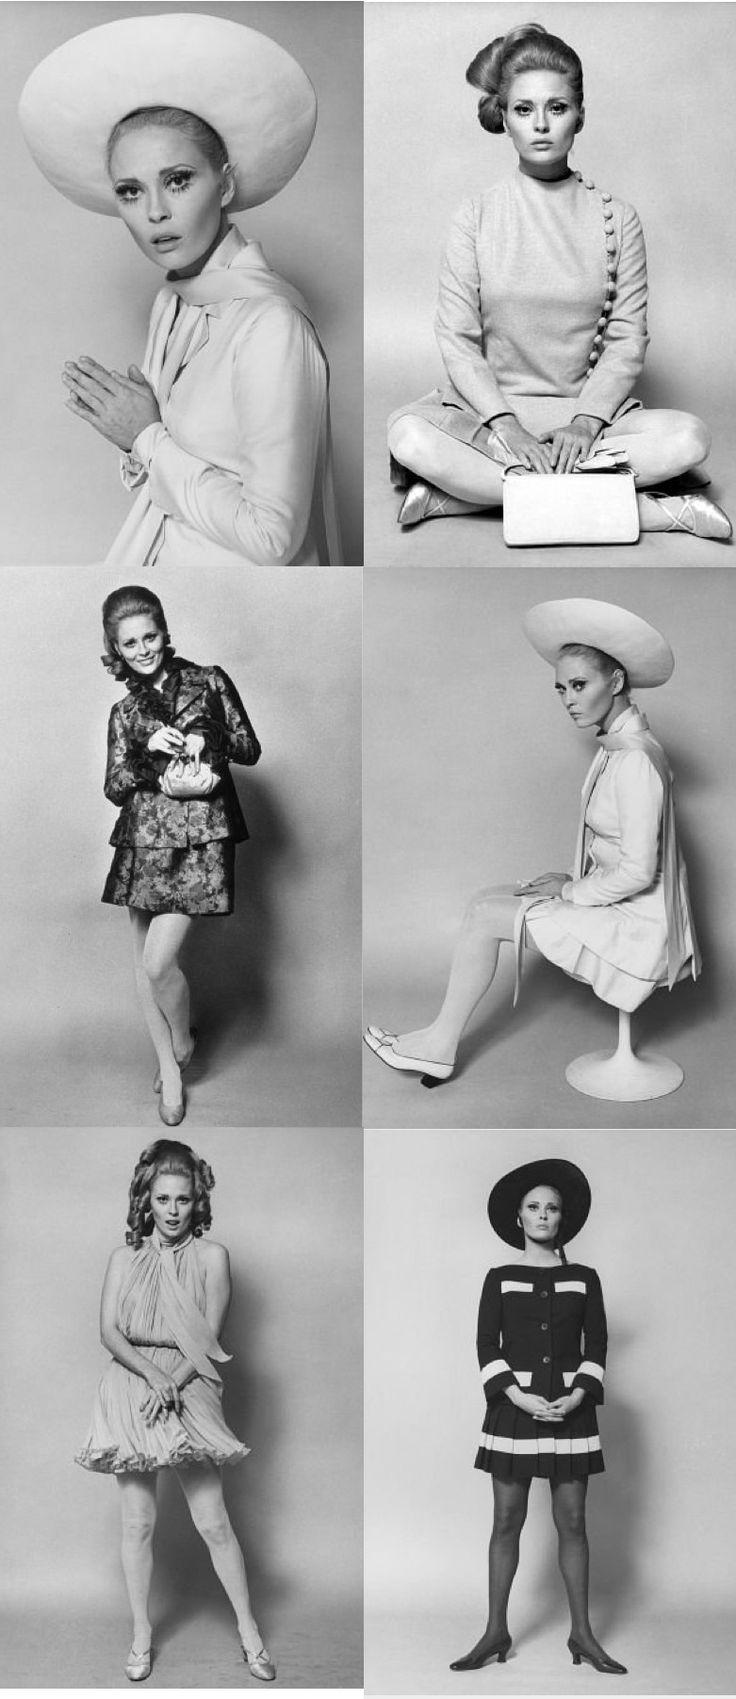 Faye Dunaway in The Thomas Crown Affair (1968). Costume Designer: Theadora Van Runkle. Faye Dunaway is so cool.